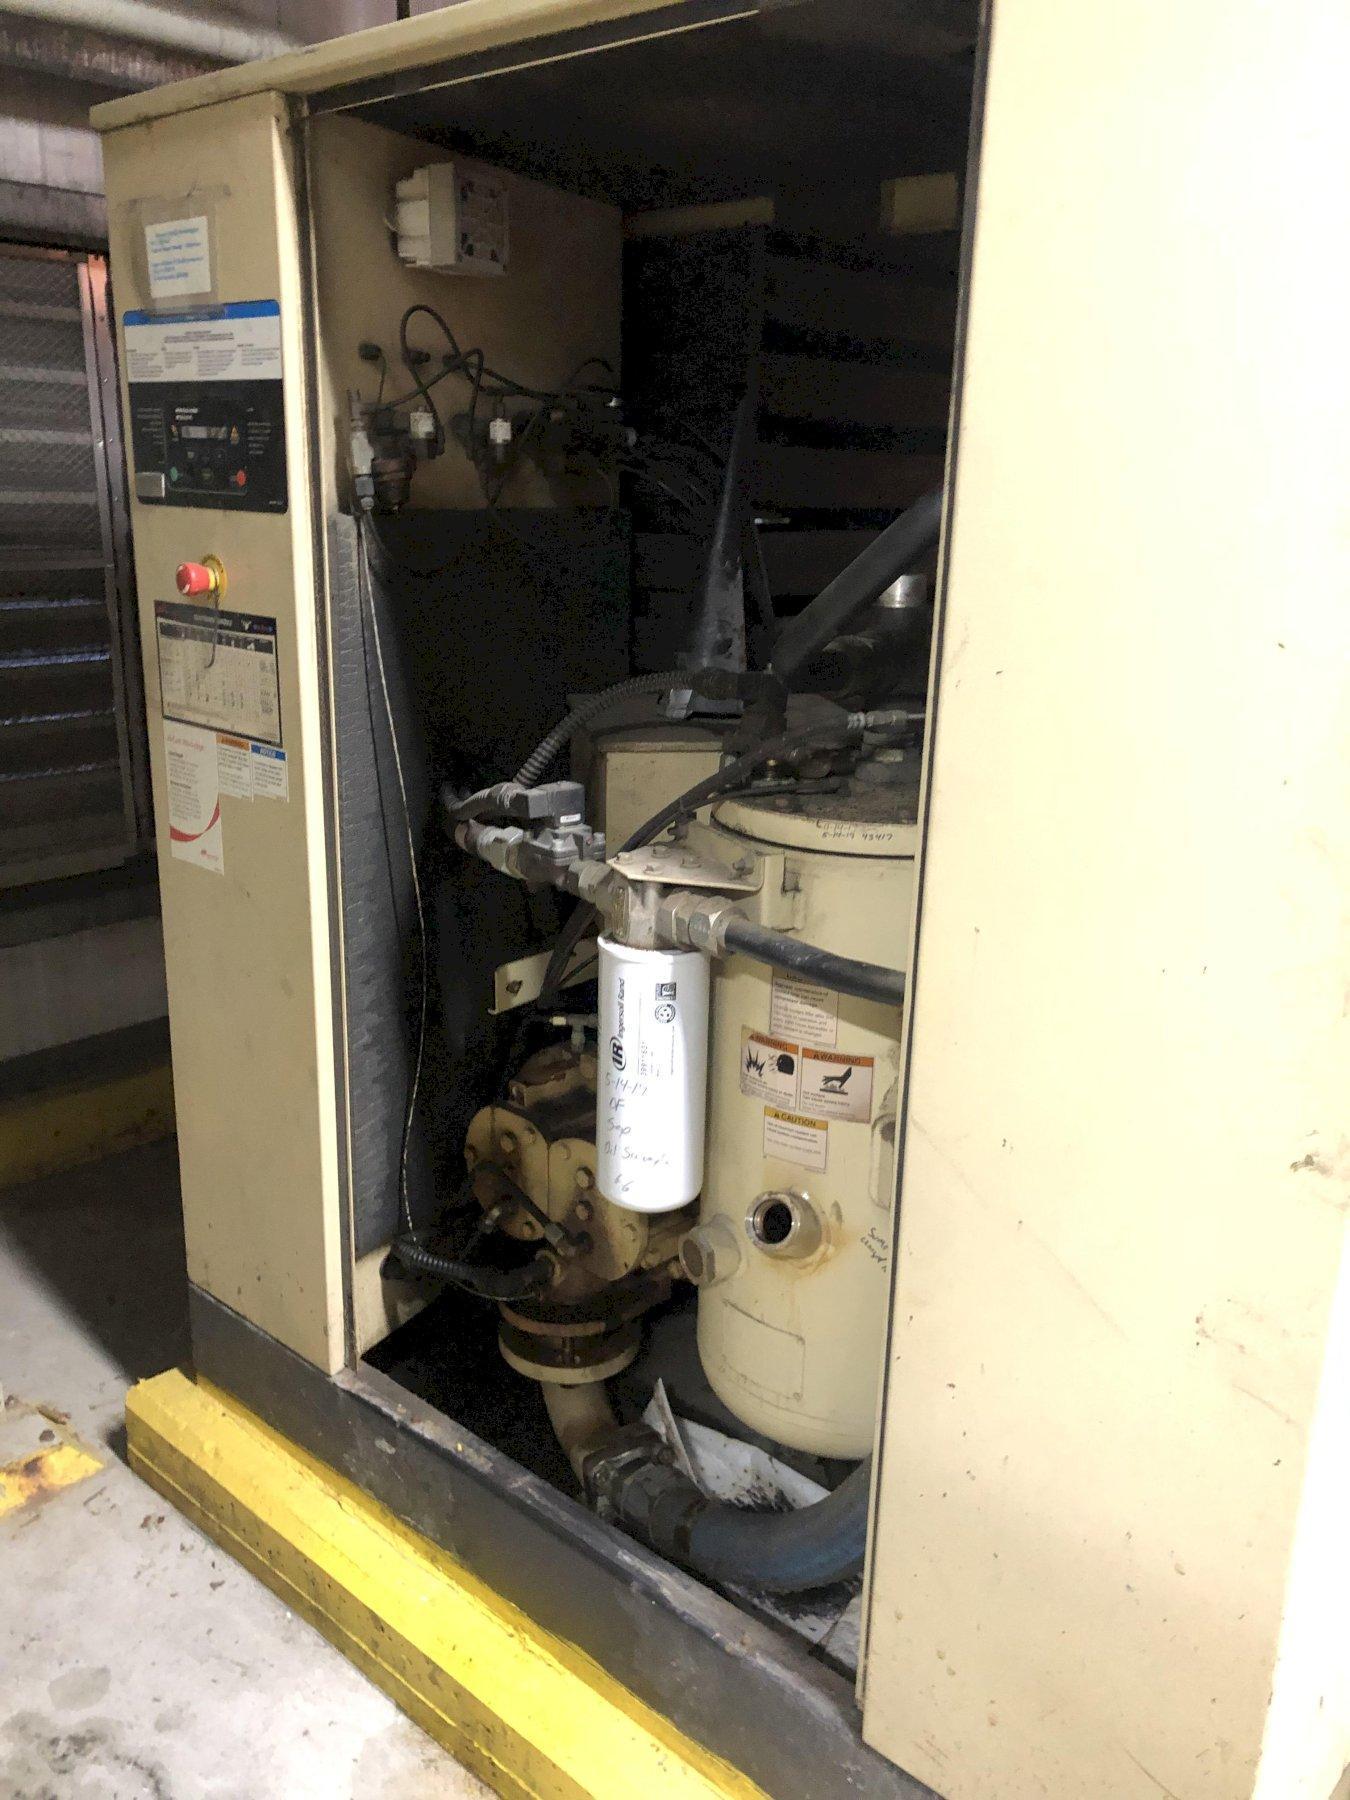 2008 Ingersol Rand model ssr-xf75 screw type air compressor s/n ck8180u08169, digital readout